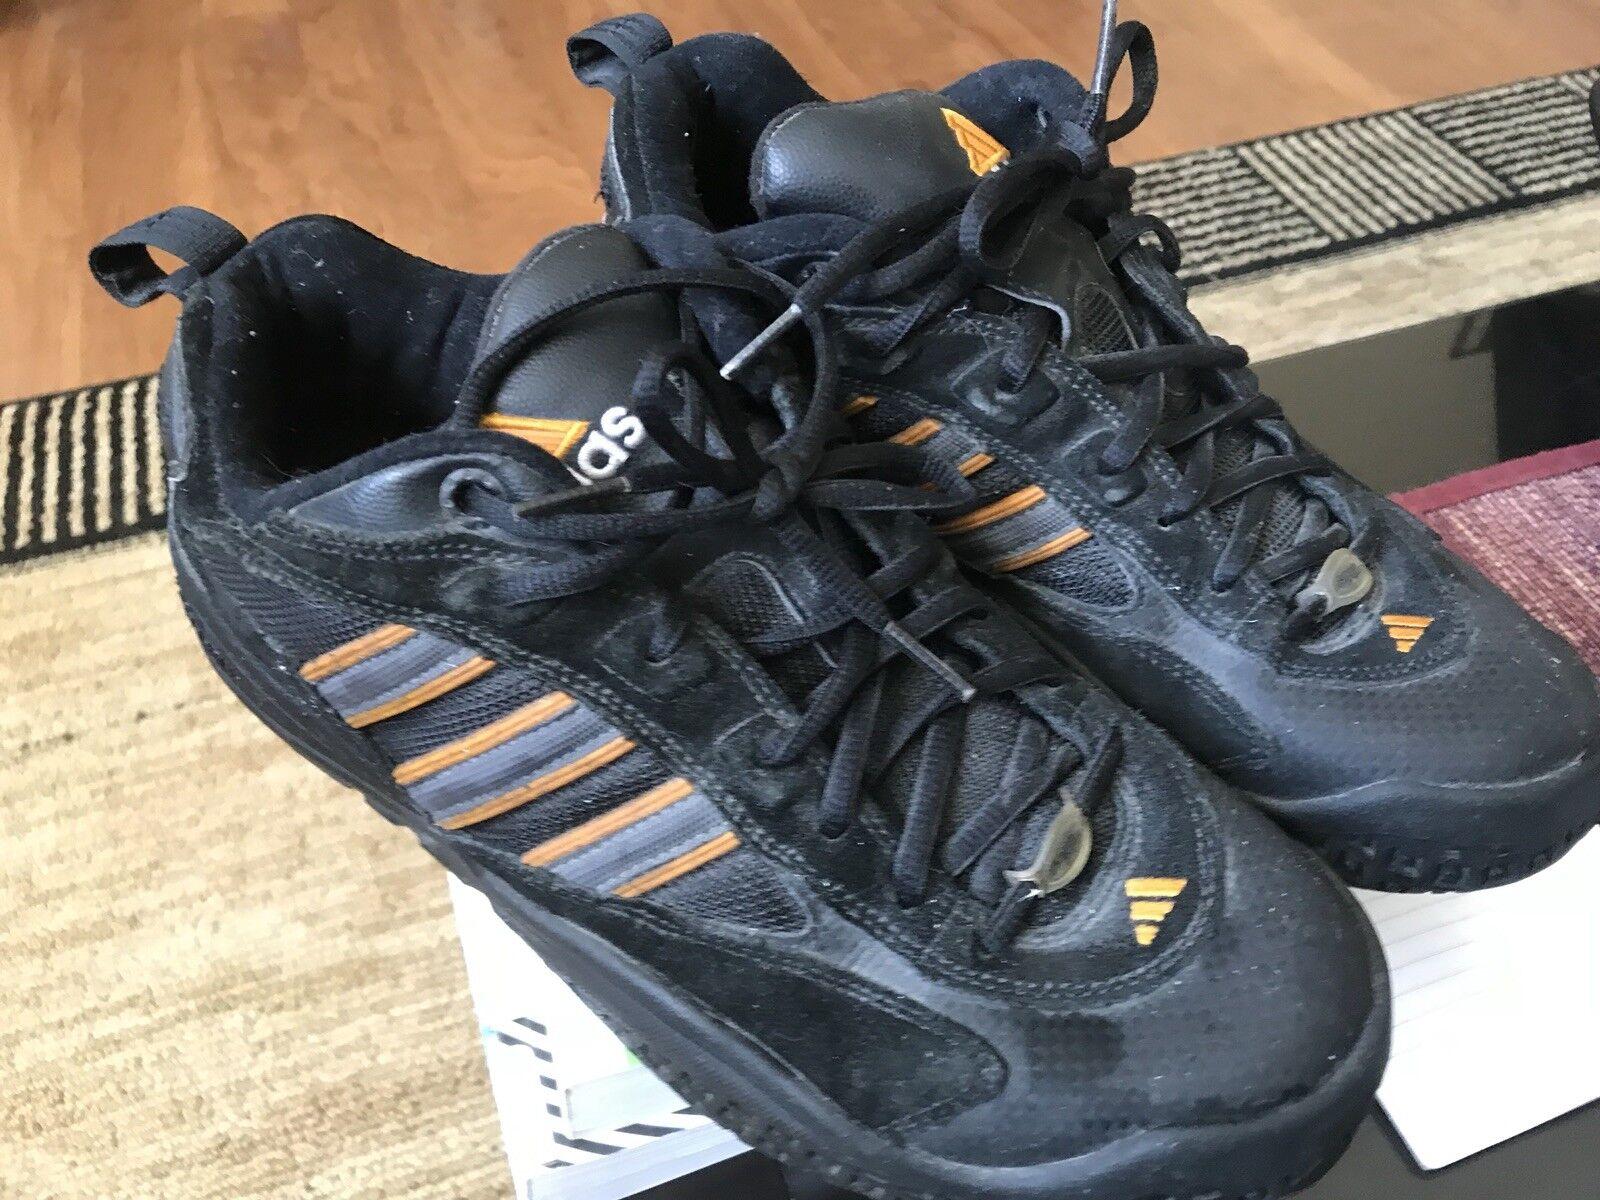 BMX Dave Mirra Adidas Mirra lll shoes. Size 10. Amazing. Rare